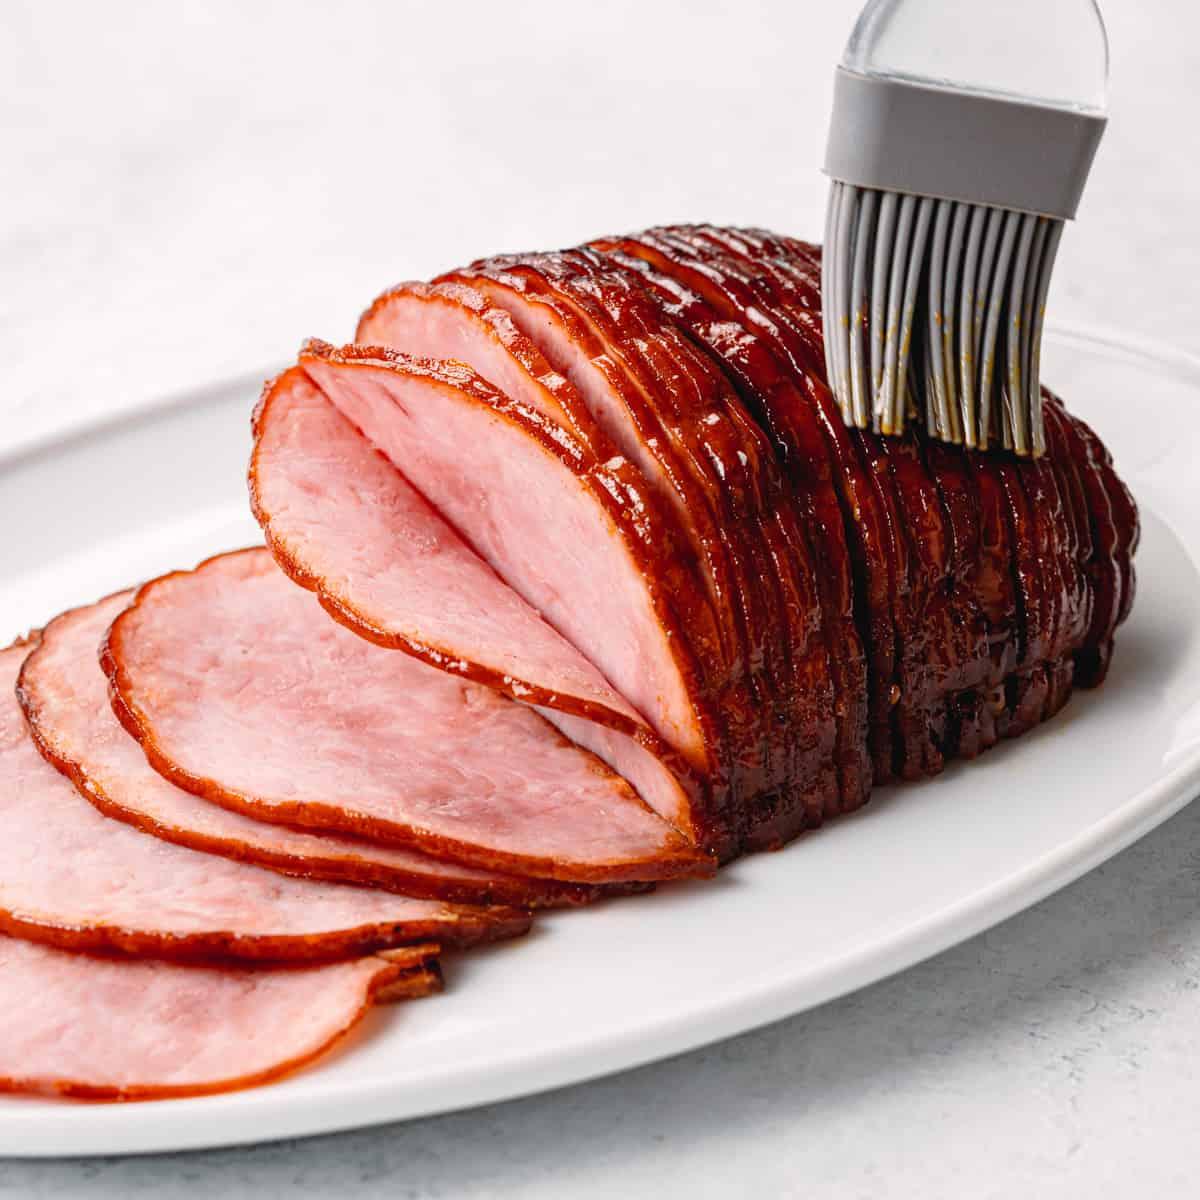 Instant Pot Ham with Orange Glaze